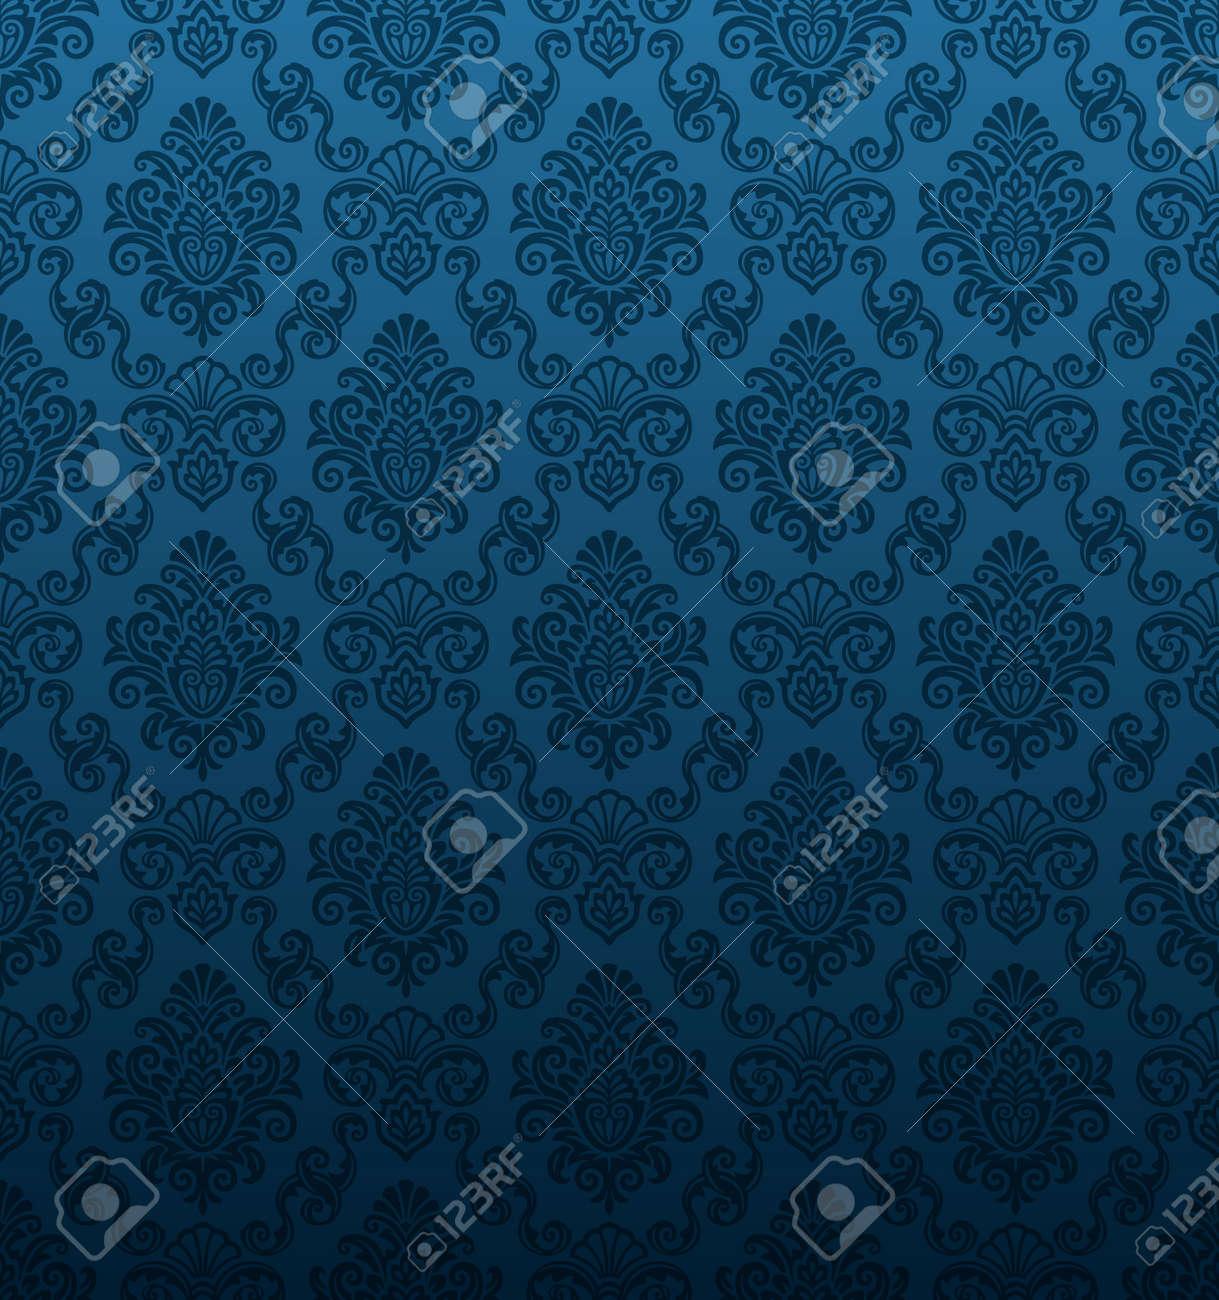 Seamless Damask Wallpaper - 11028766